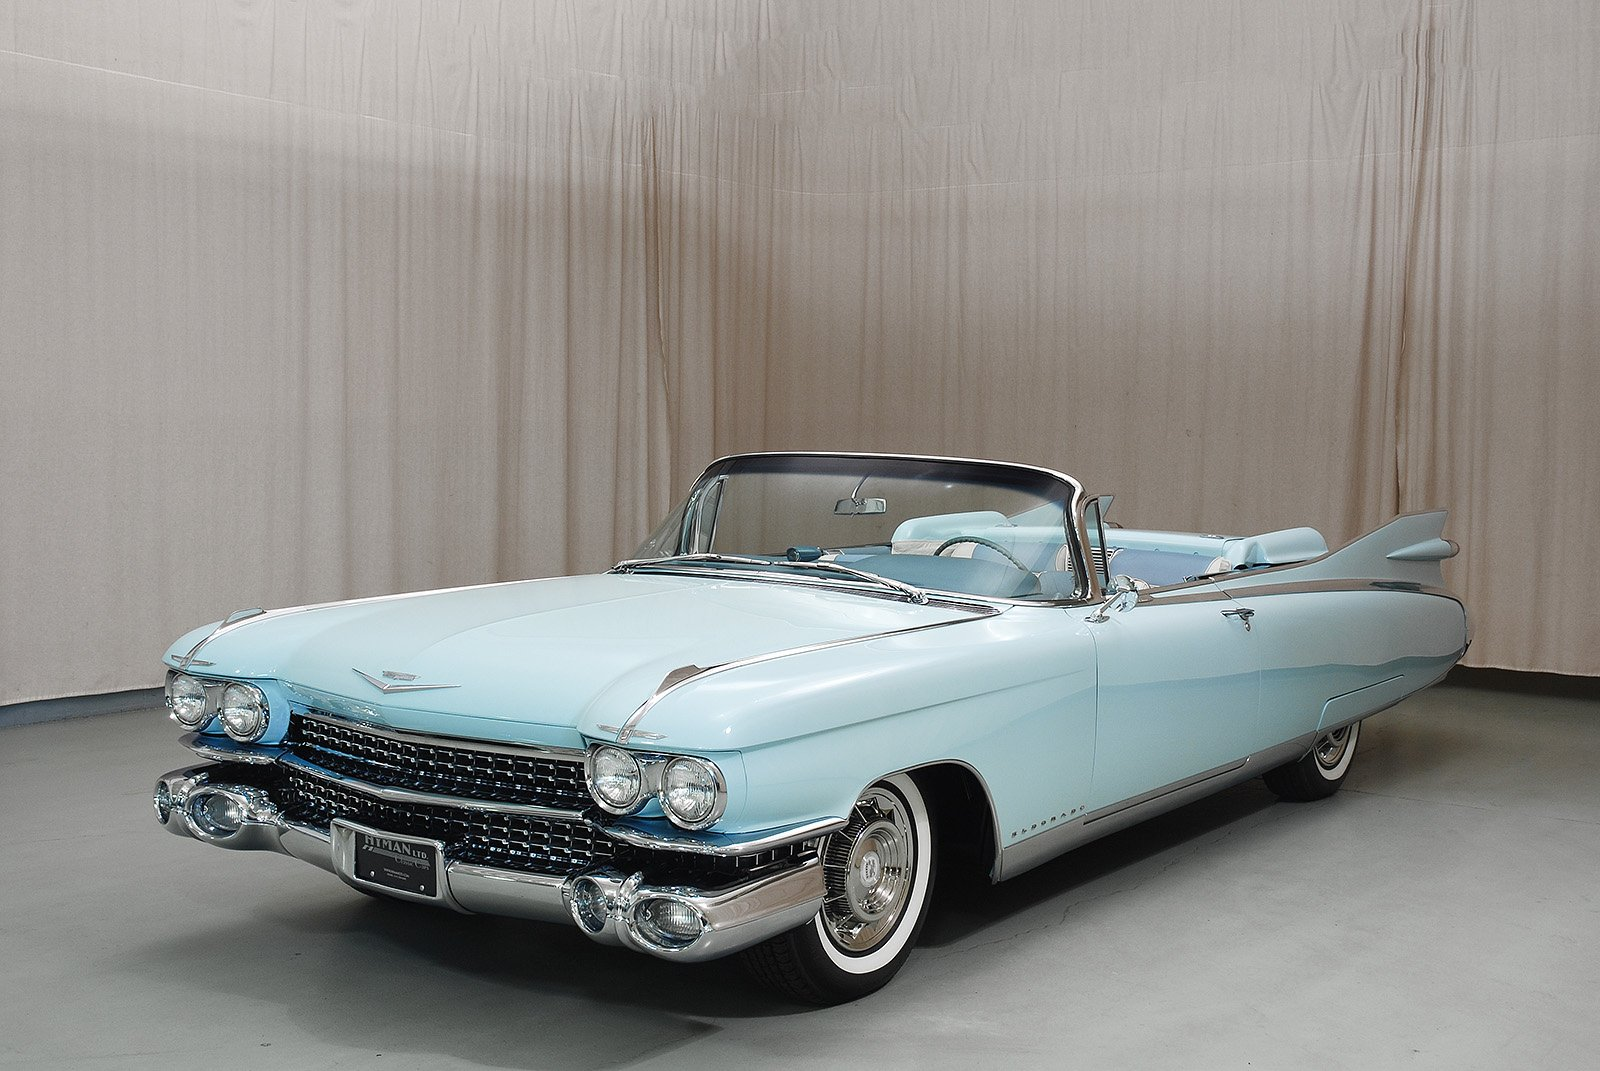 1959 Cadillac Eldorado Biarritz Convertible Hyman Ltd